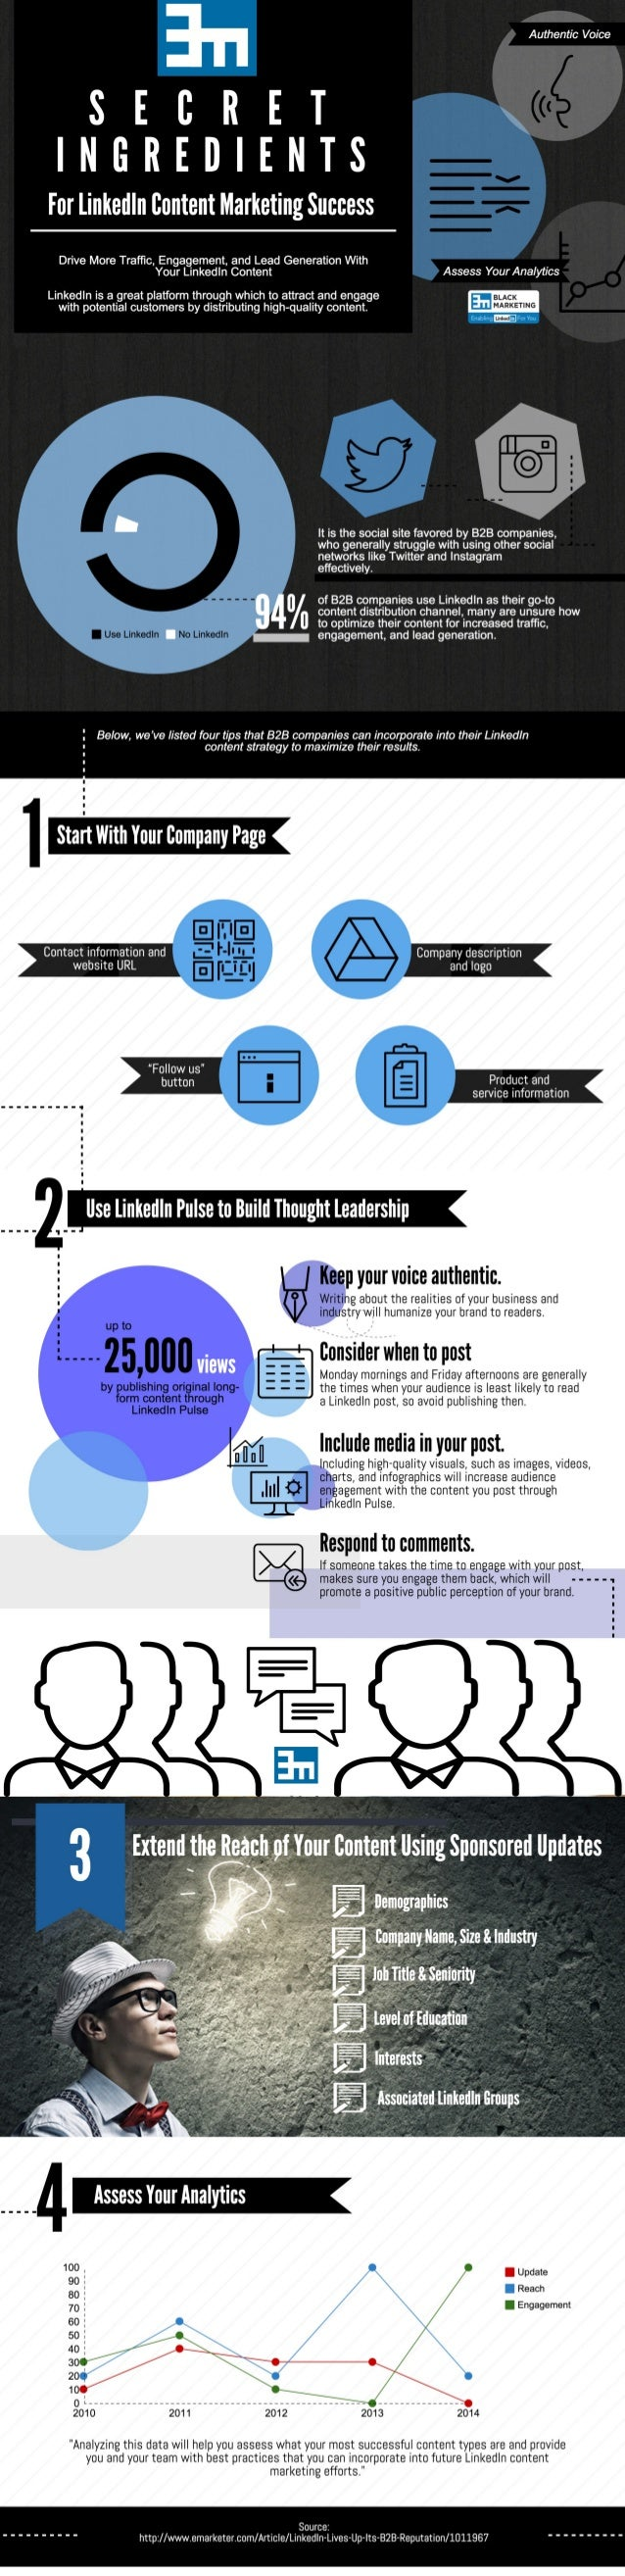 Secret Ingredients For LinkedIn Content Marketing Success